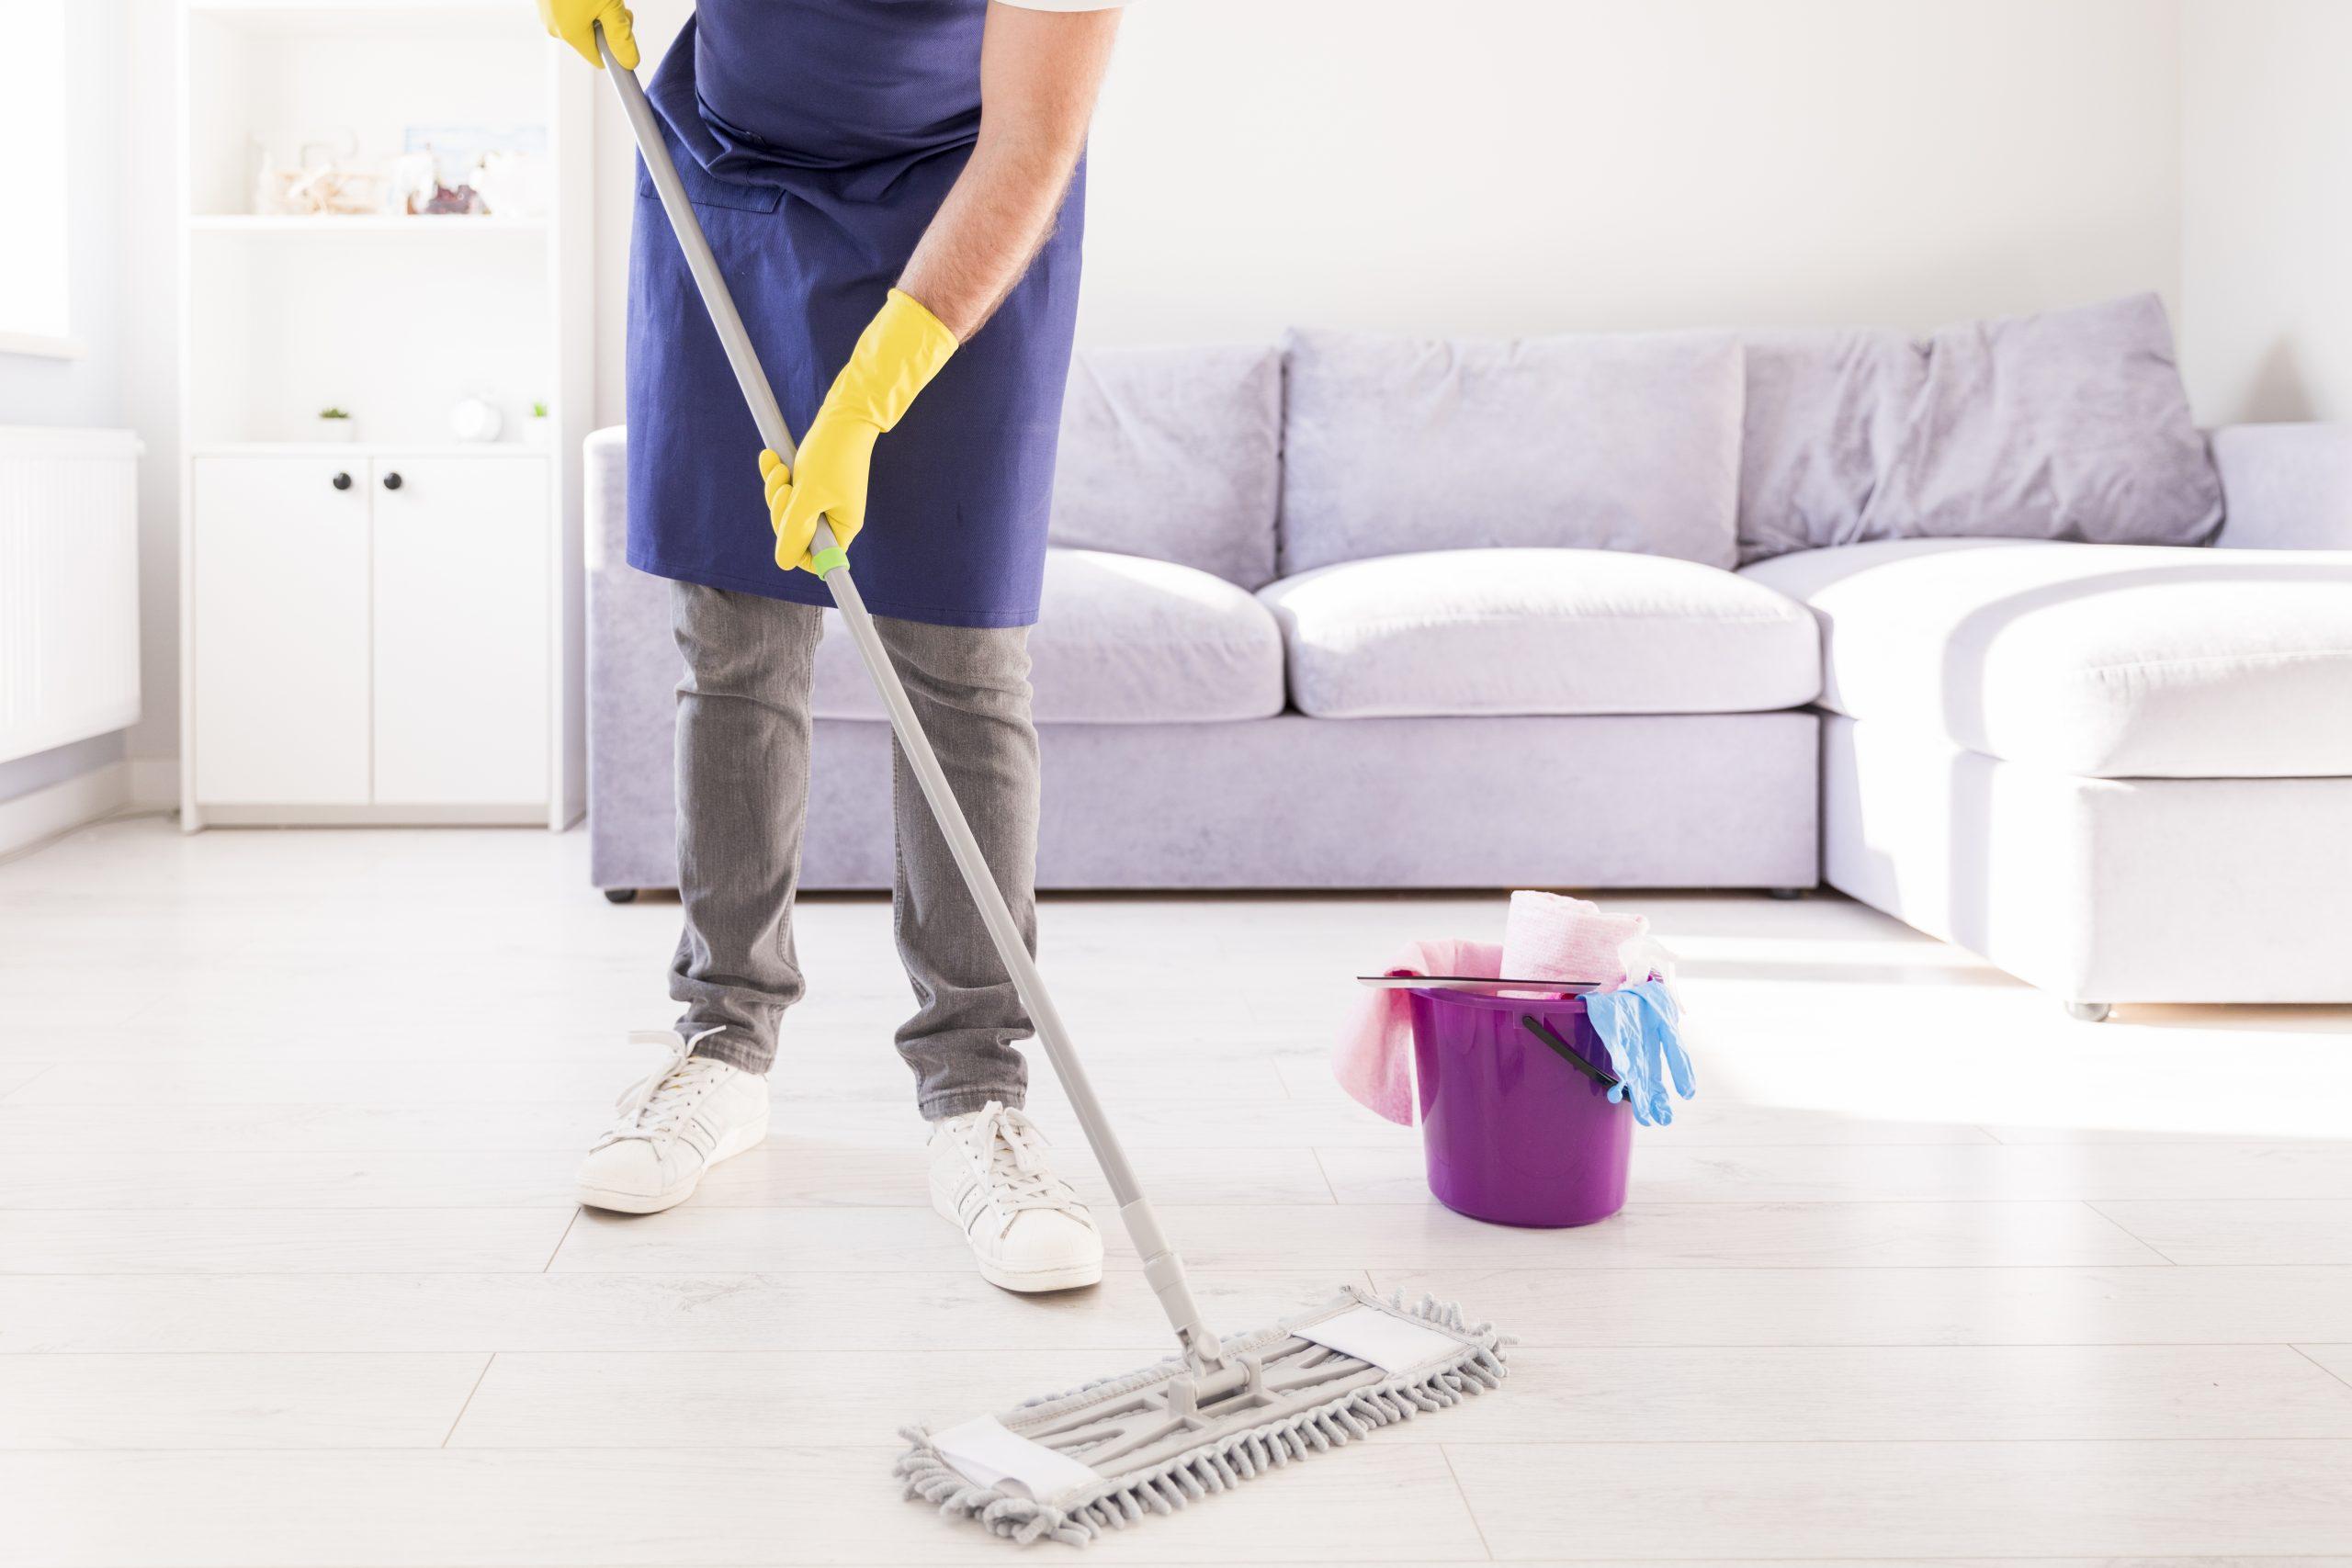 професионалните фирми за почистване